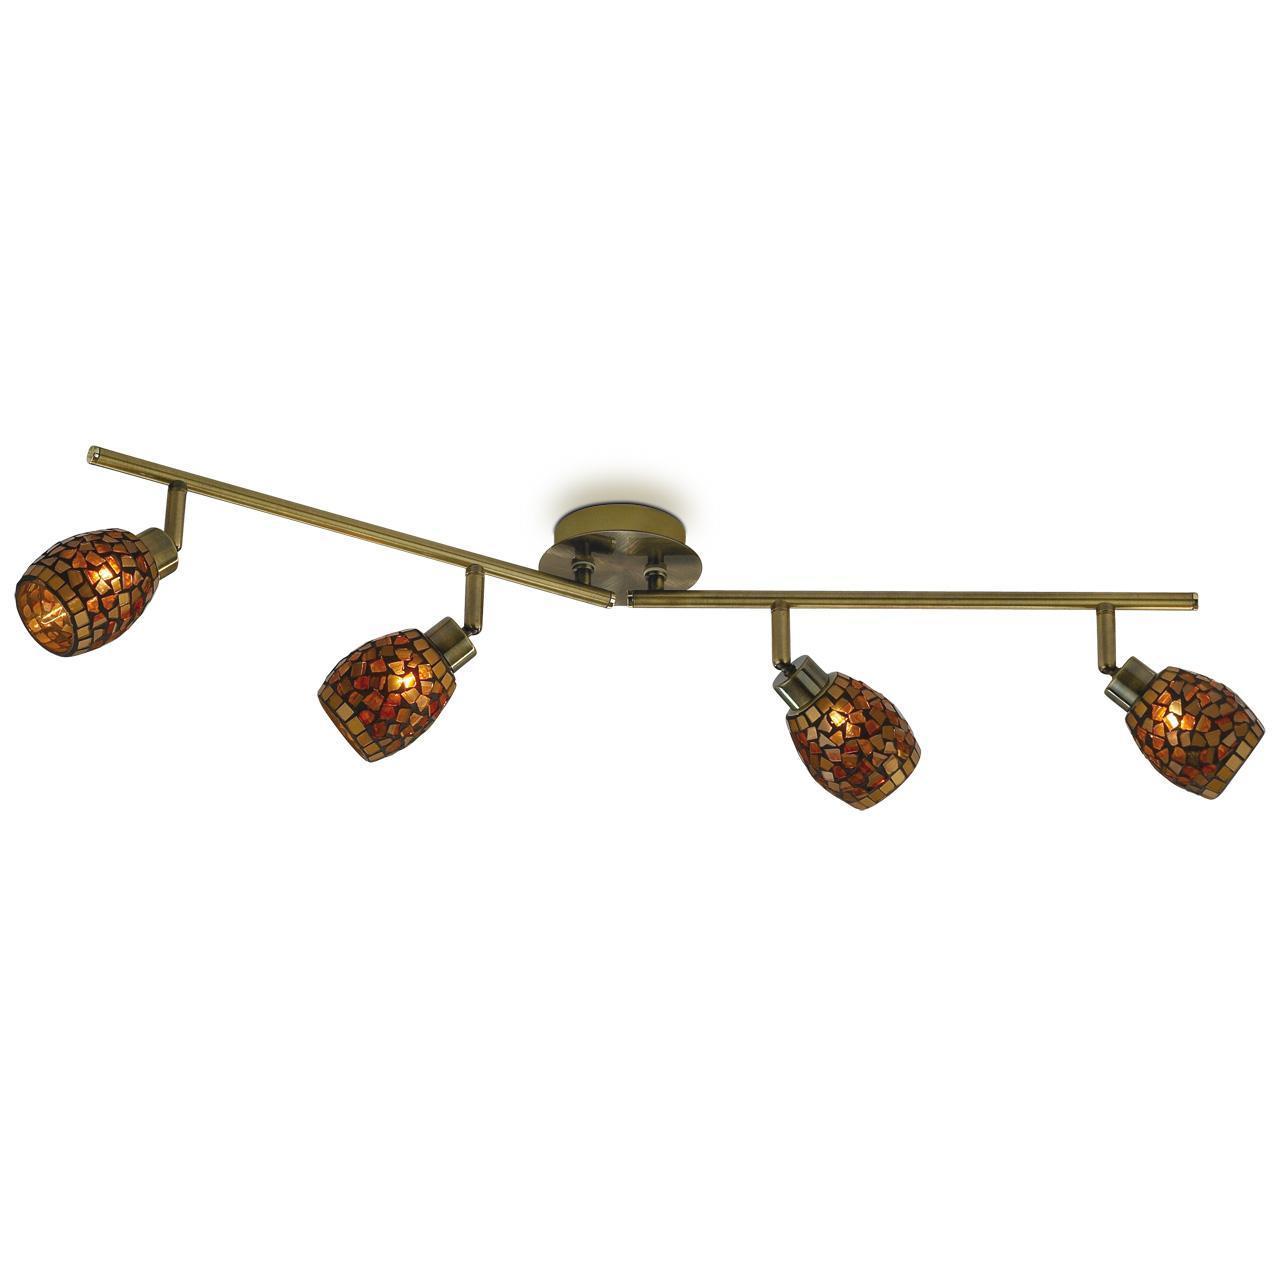 Спот Odeon Light Glosse 2167/4W светильник настенный odeon light 2167 4w odl11 722 g9 4 40w 220v glosse мозаика янтарный